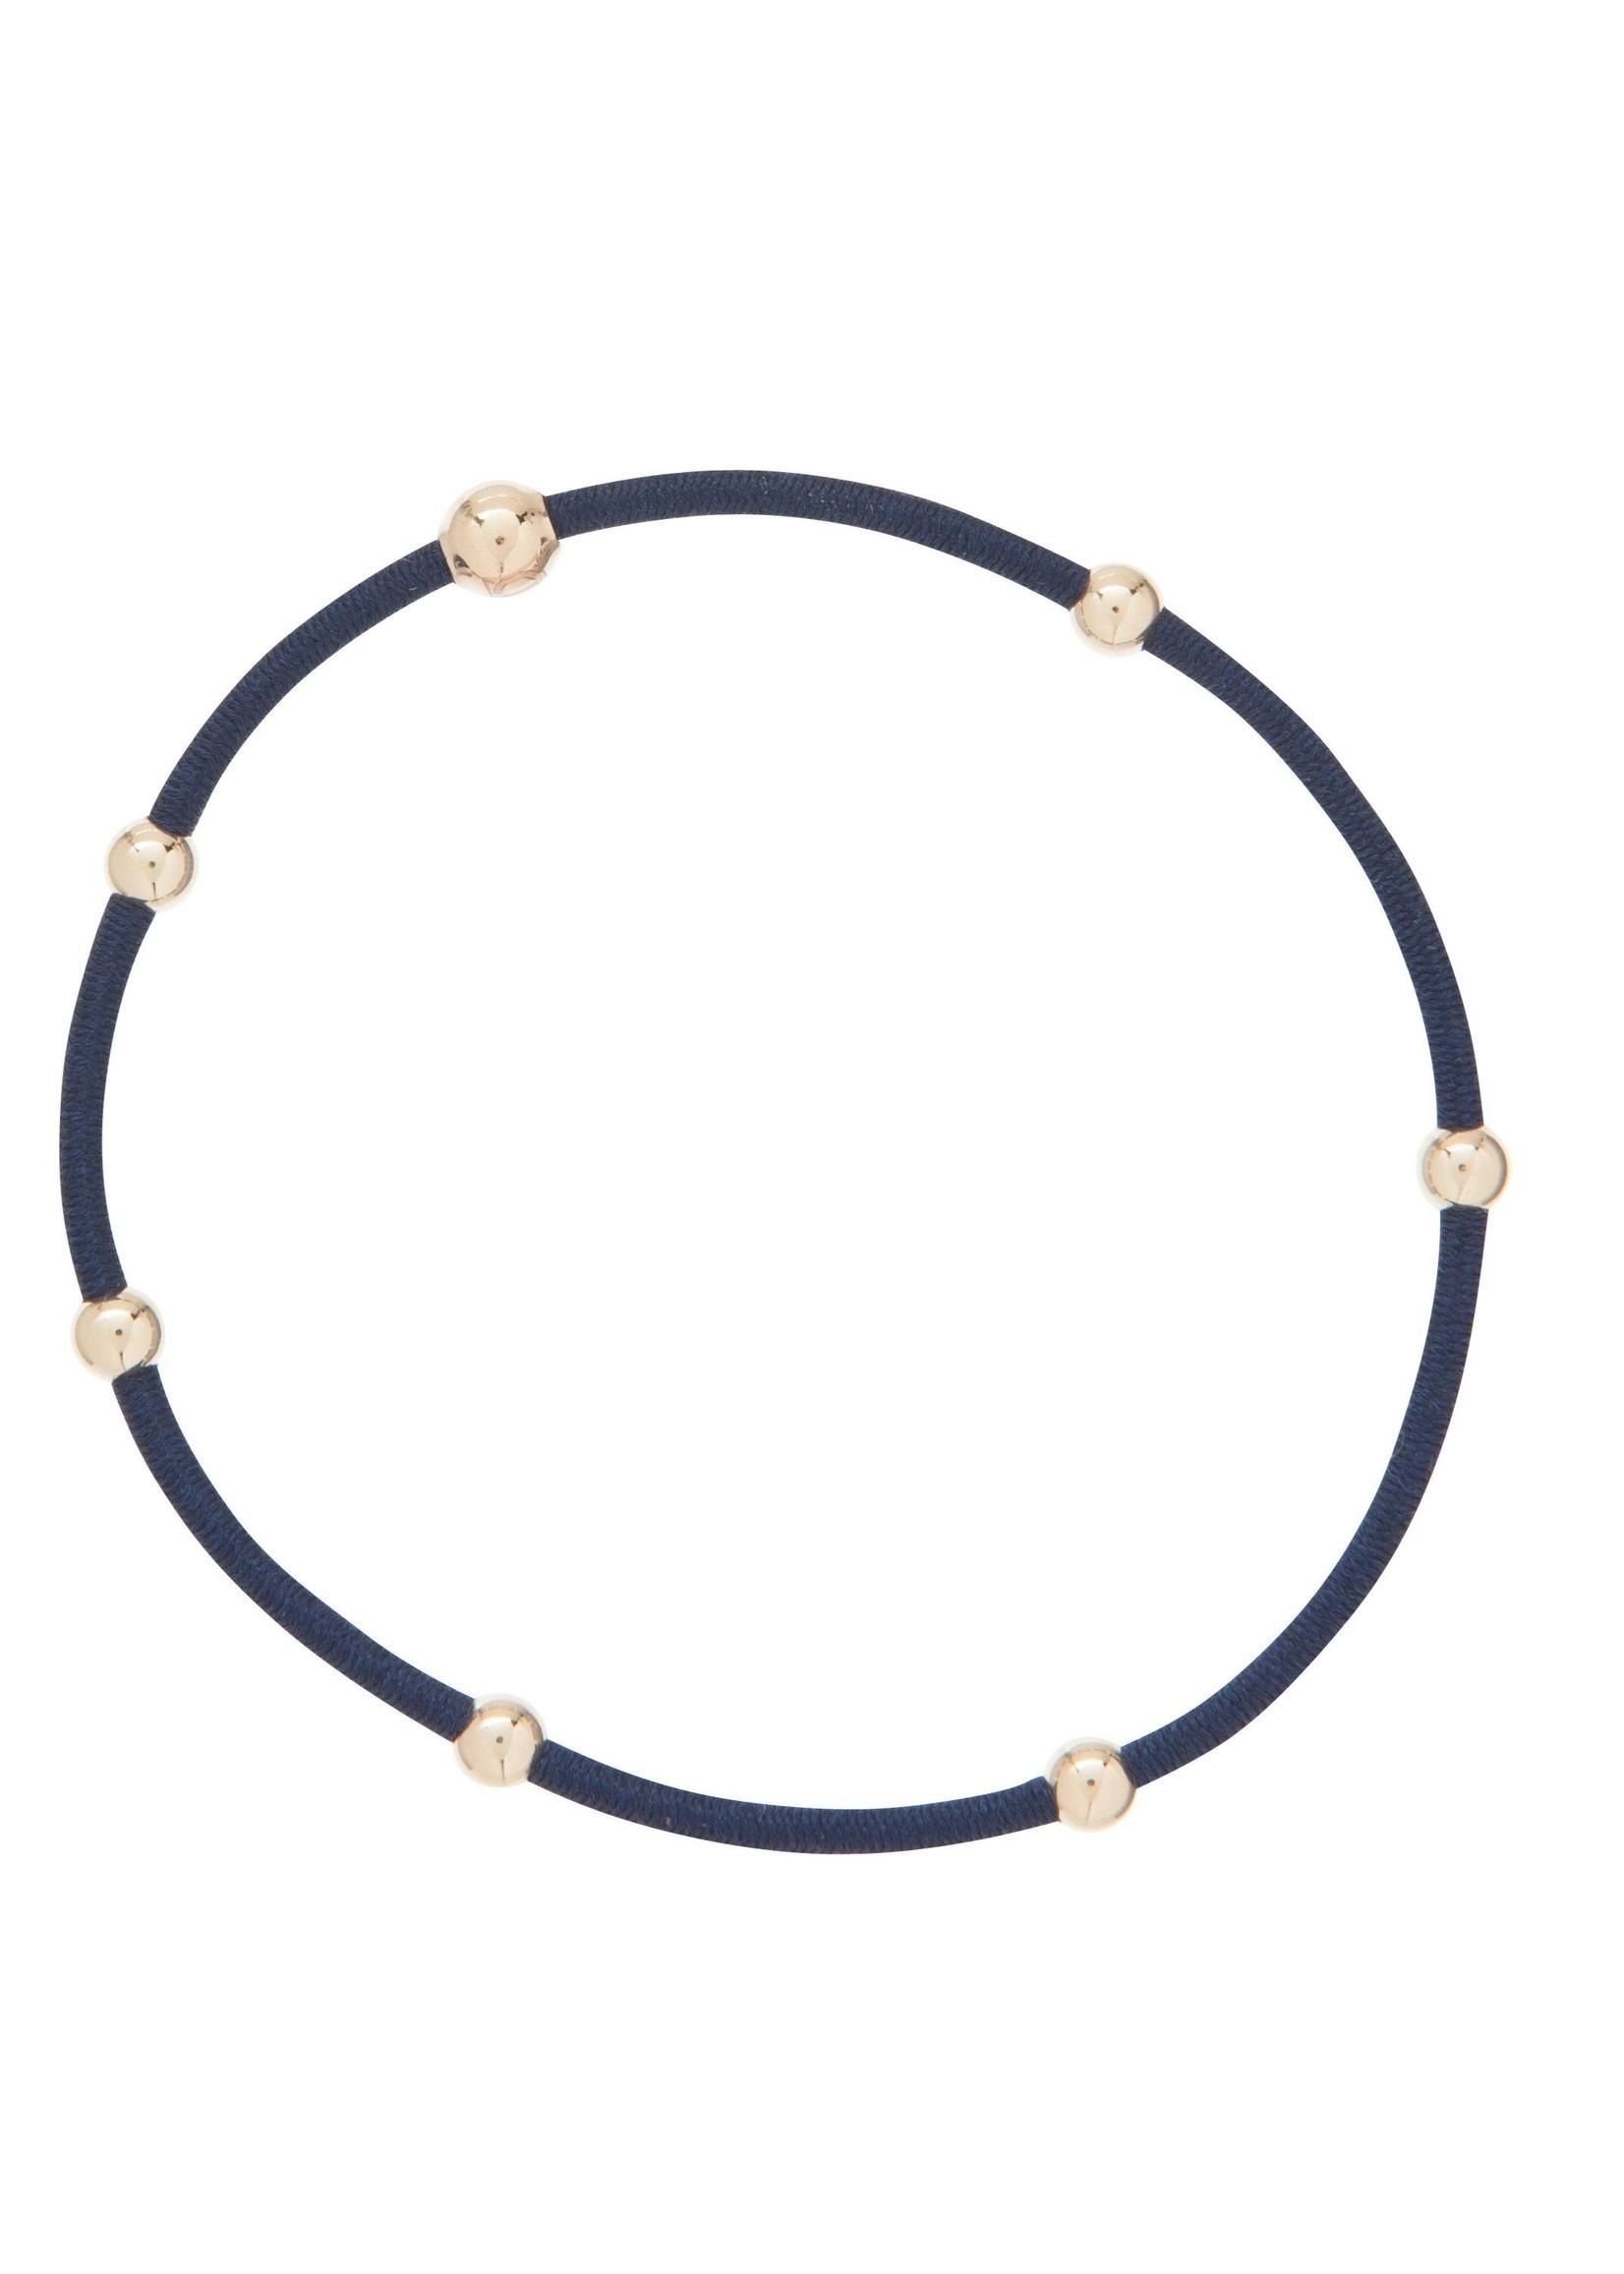 "enewton ""e""ssentials bracelet stack of 2- midnight set"